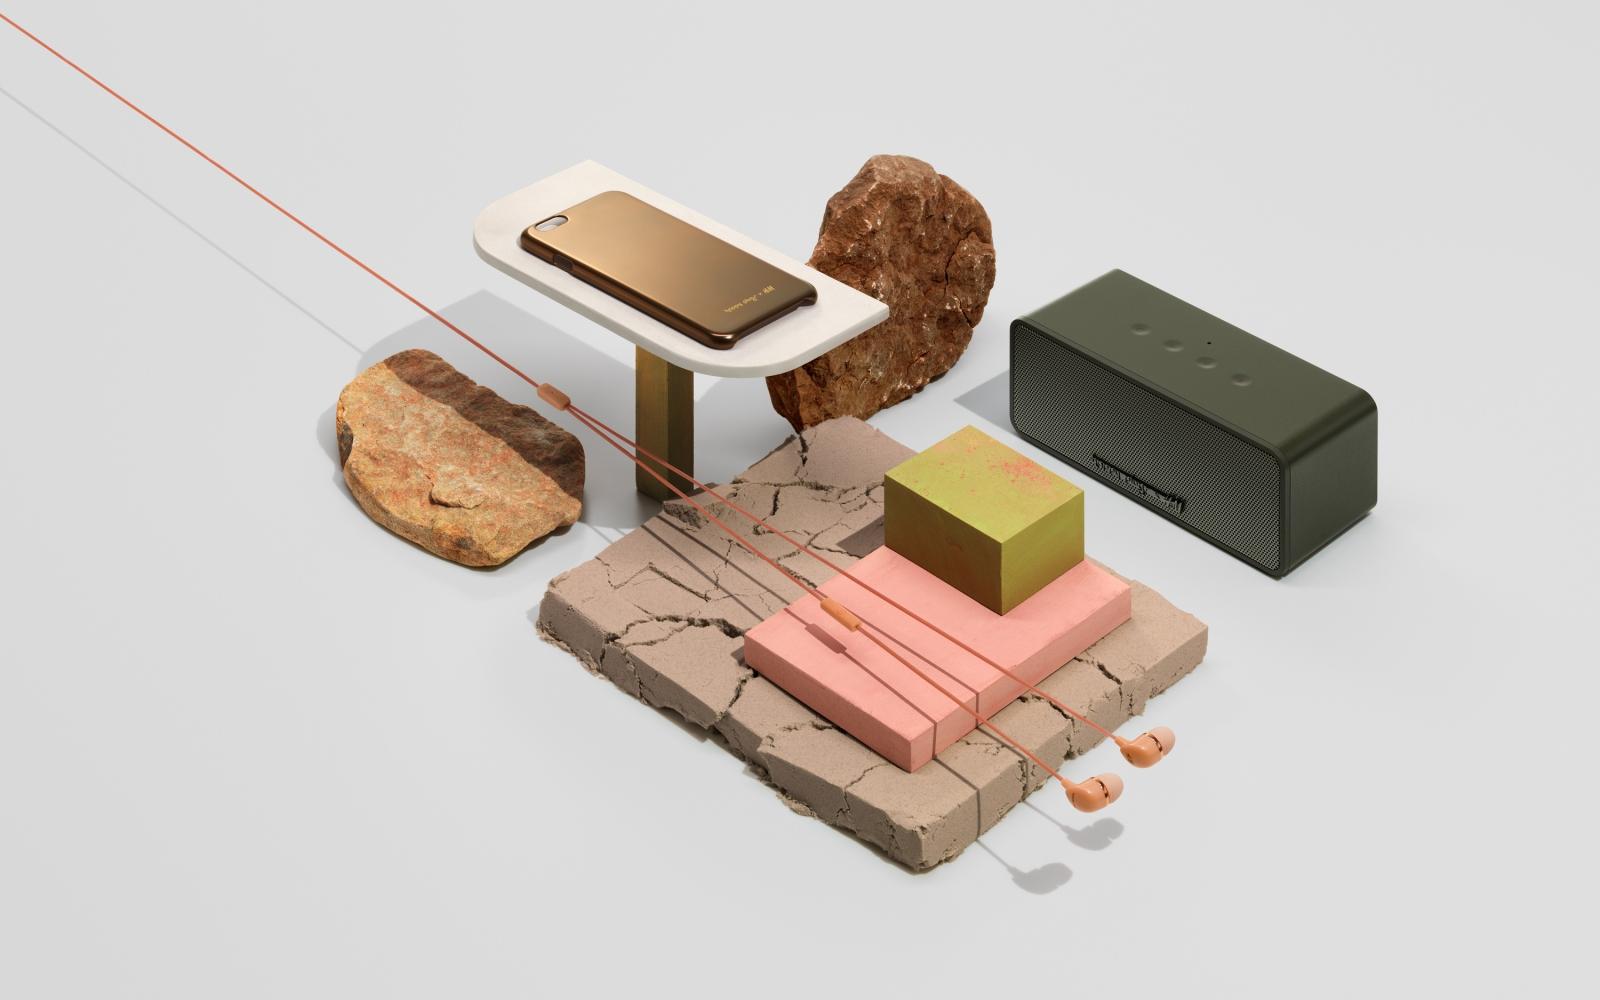 H&M x Happy Plugs – Carl Kleiner